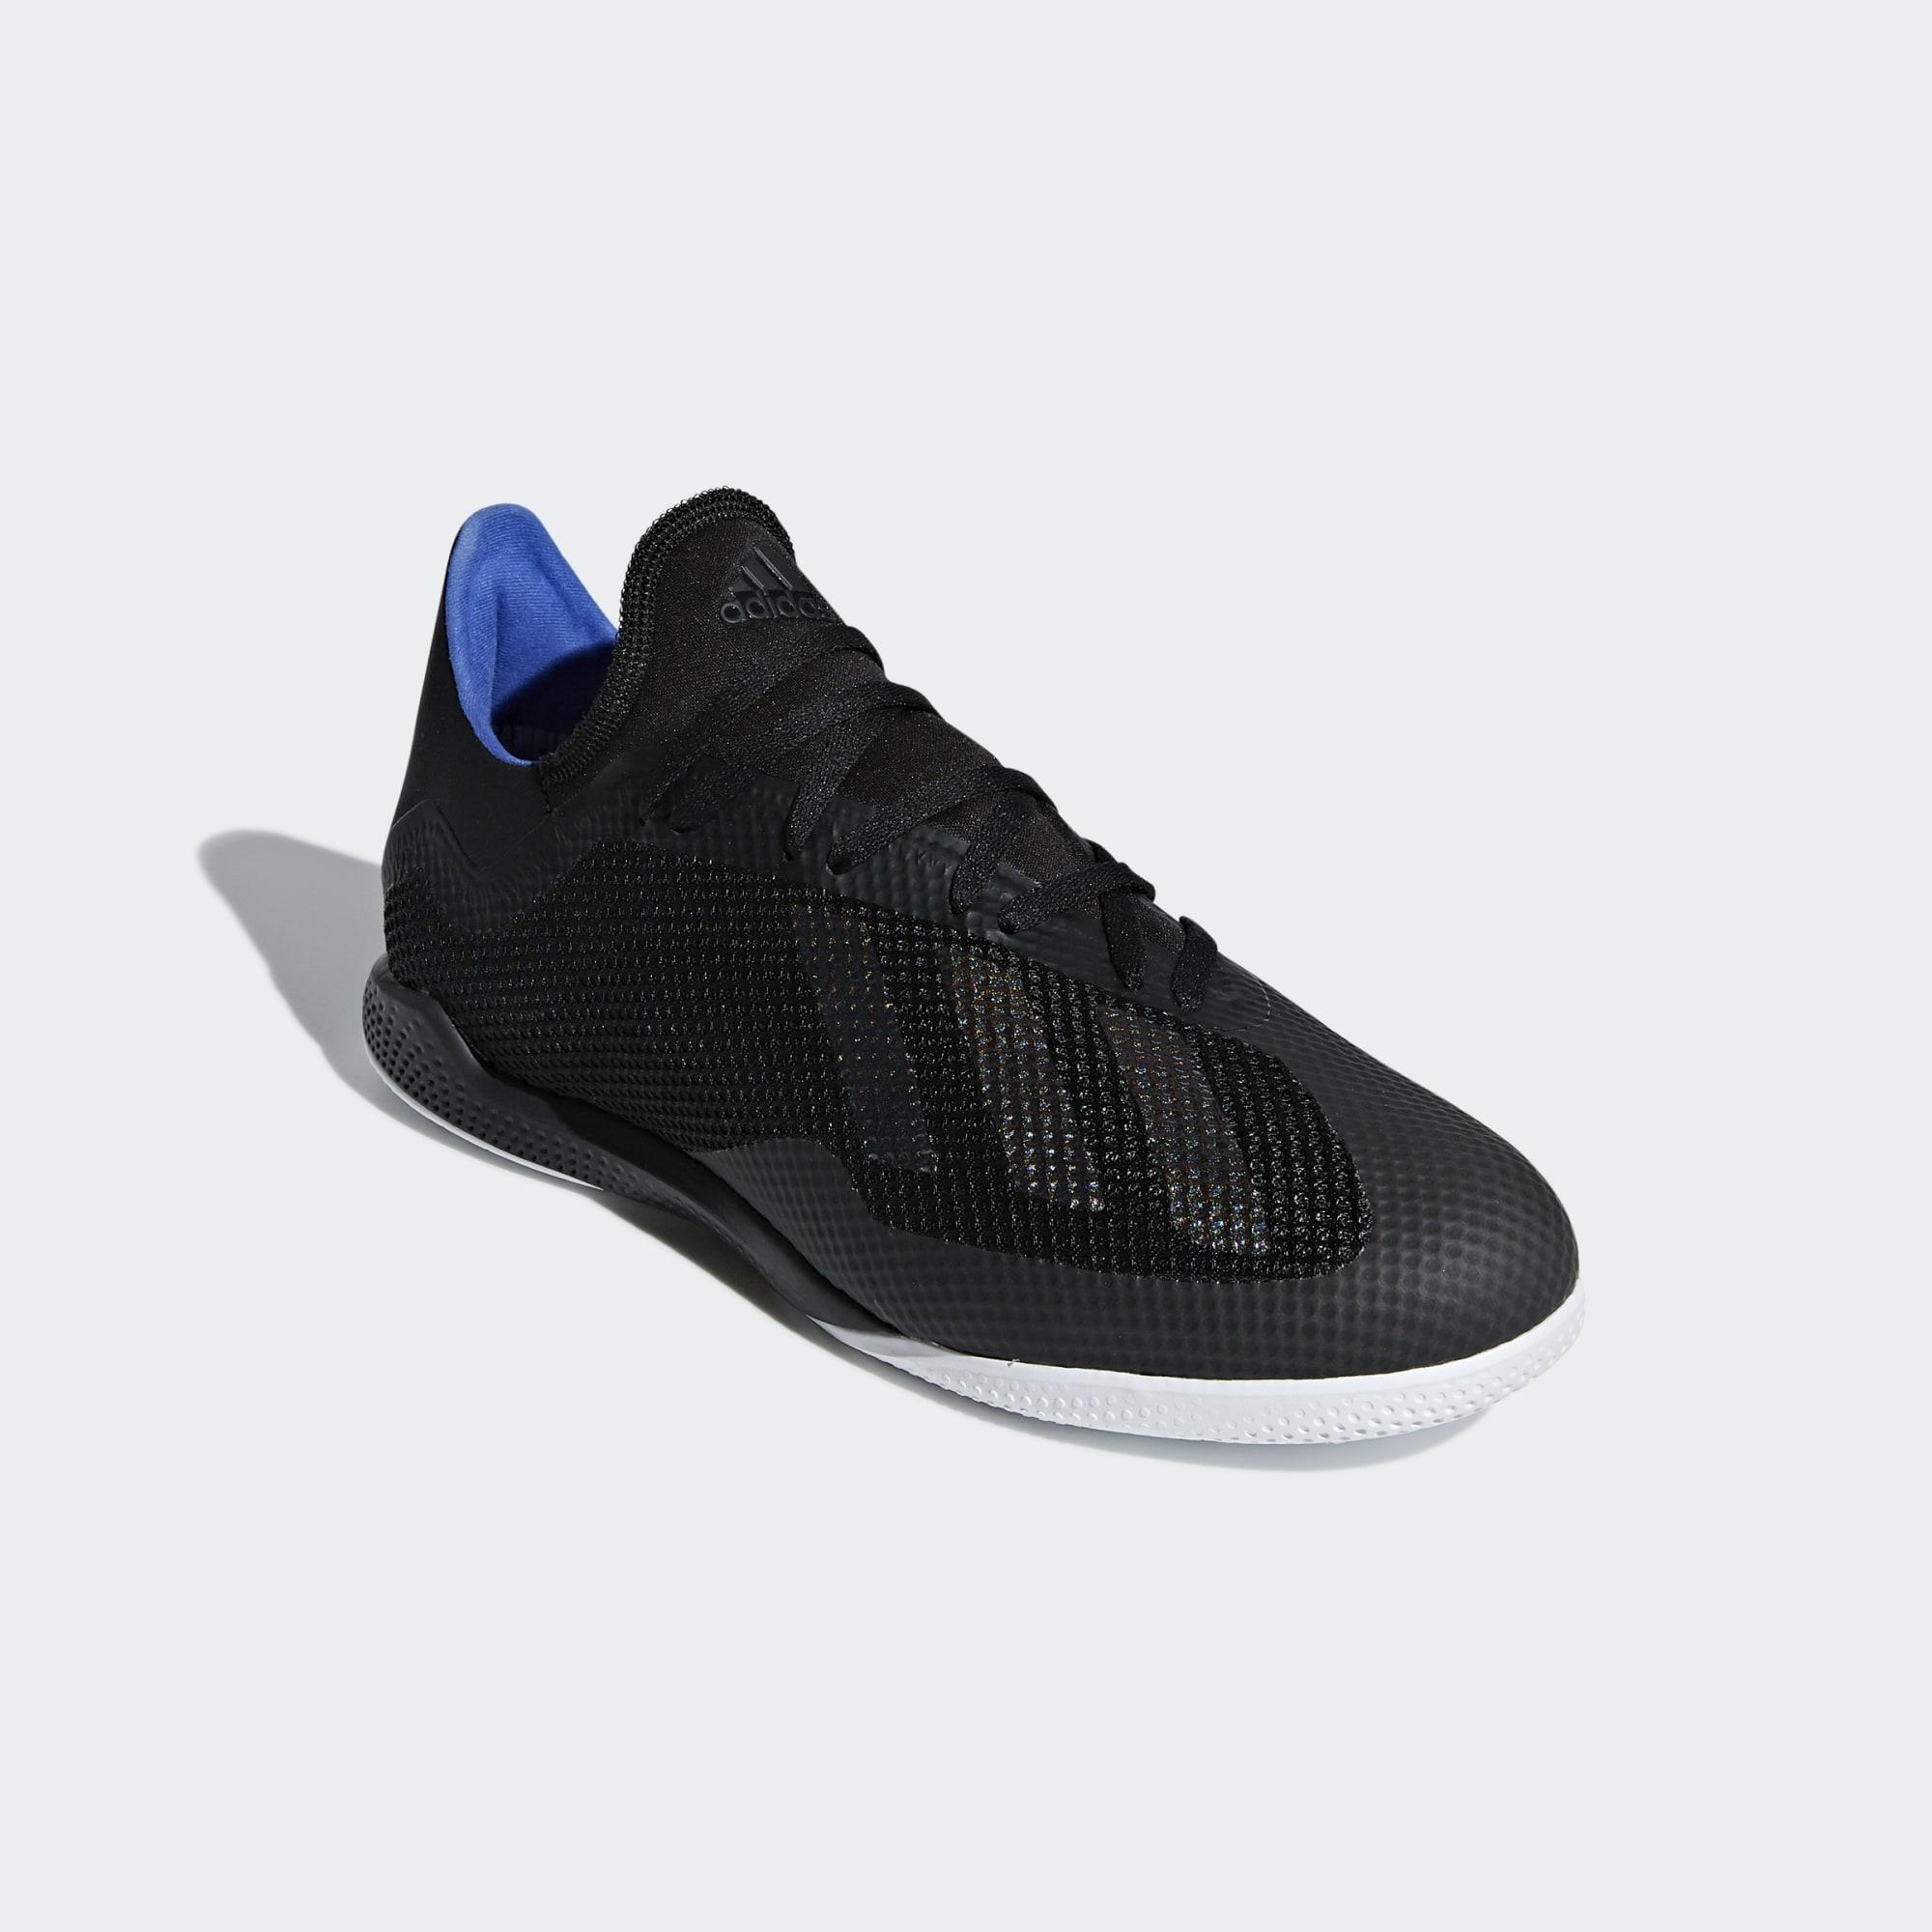 4c2b2240c ... Click to enlarge image  adidas_x_tango_18_3_in_archetic_core_black_core_black_bold_blue_7.jpg ...